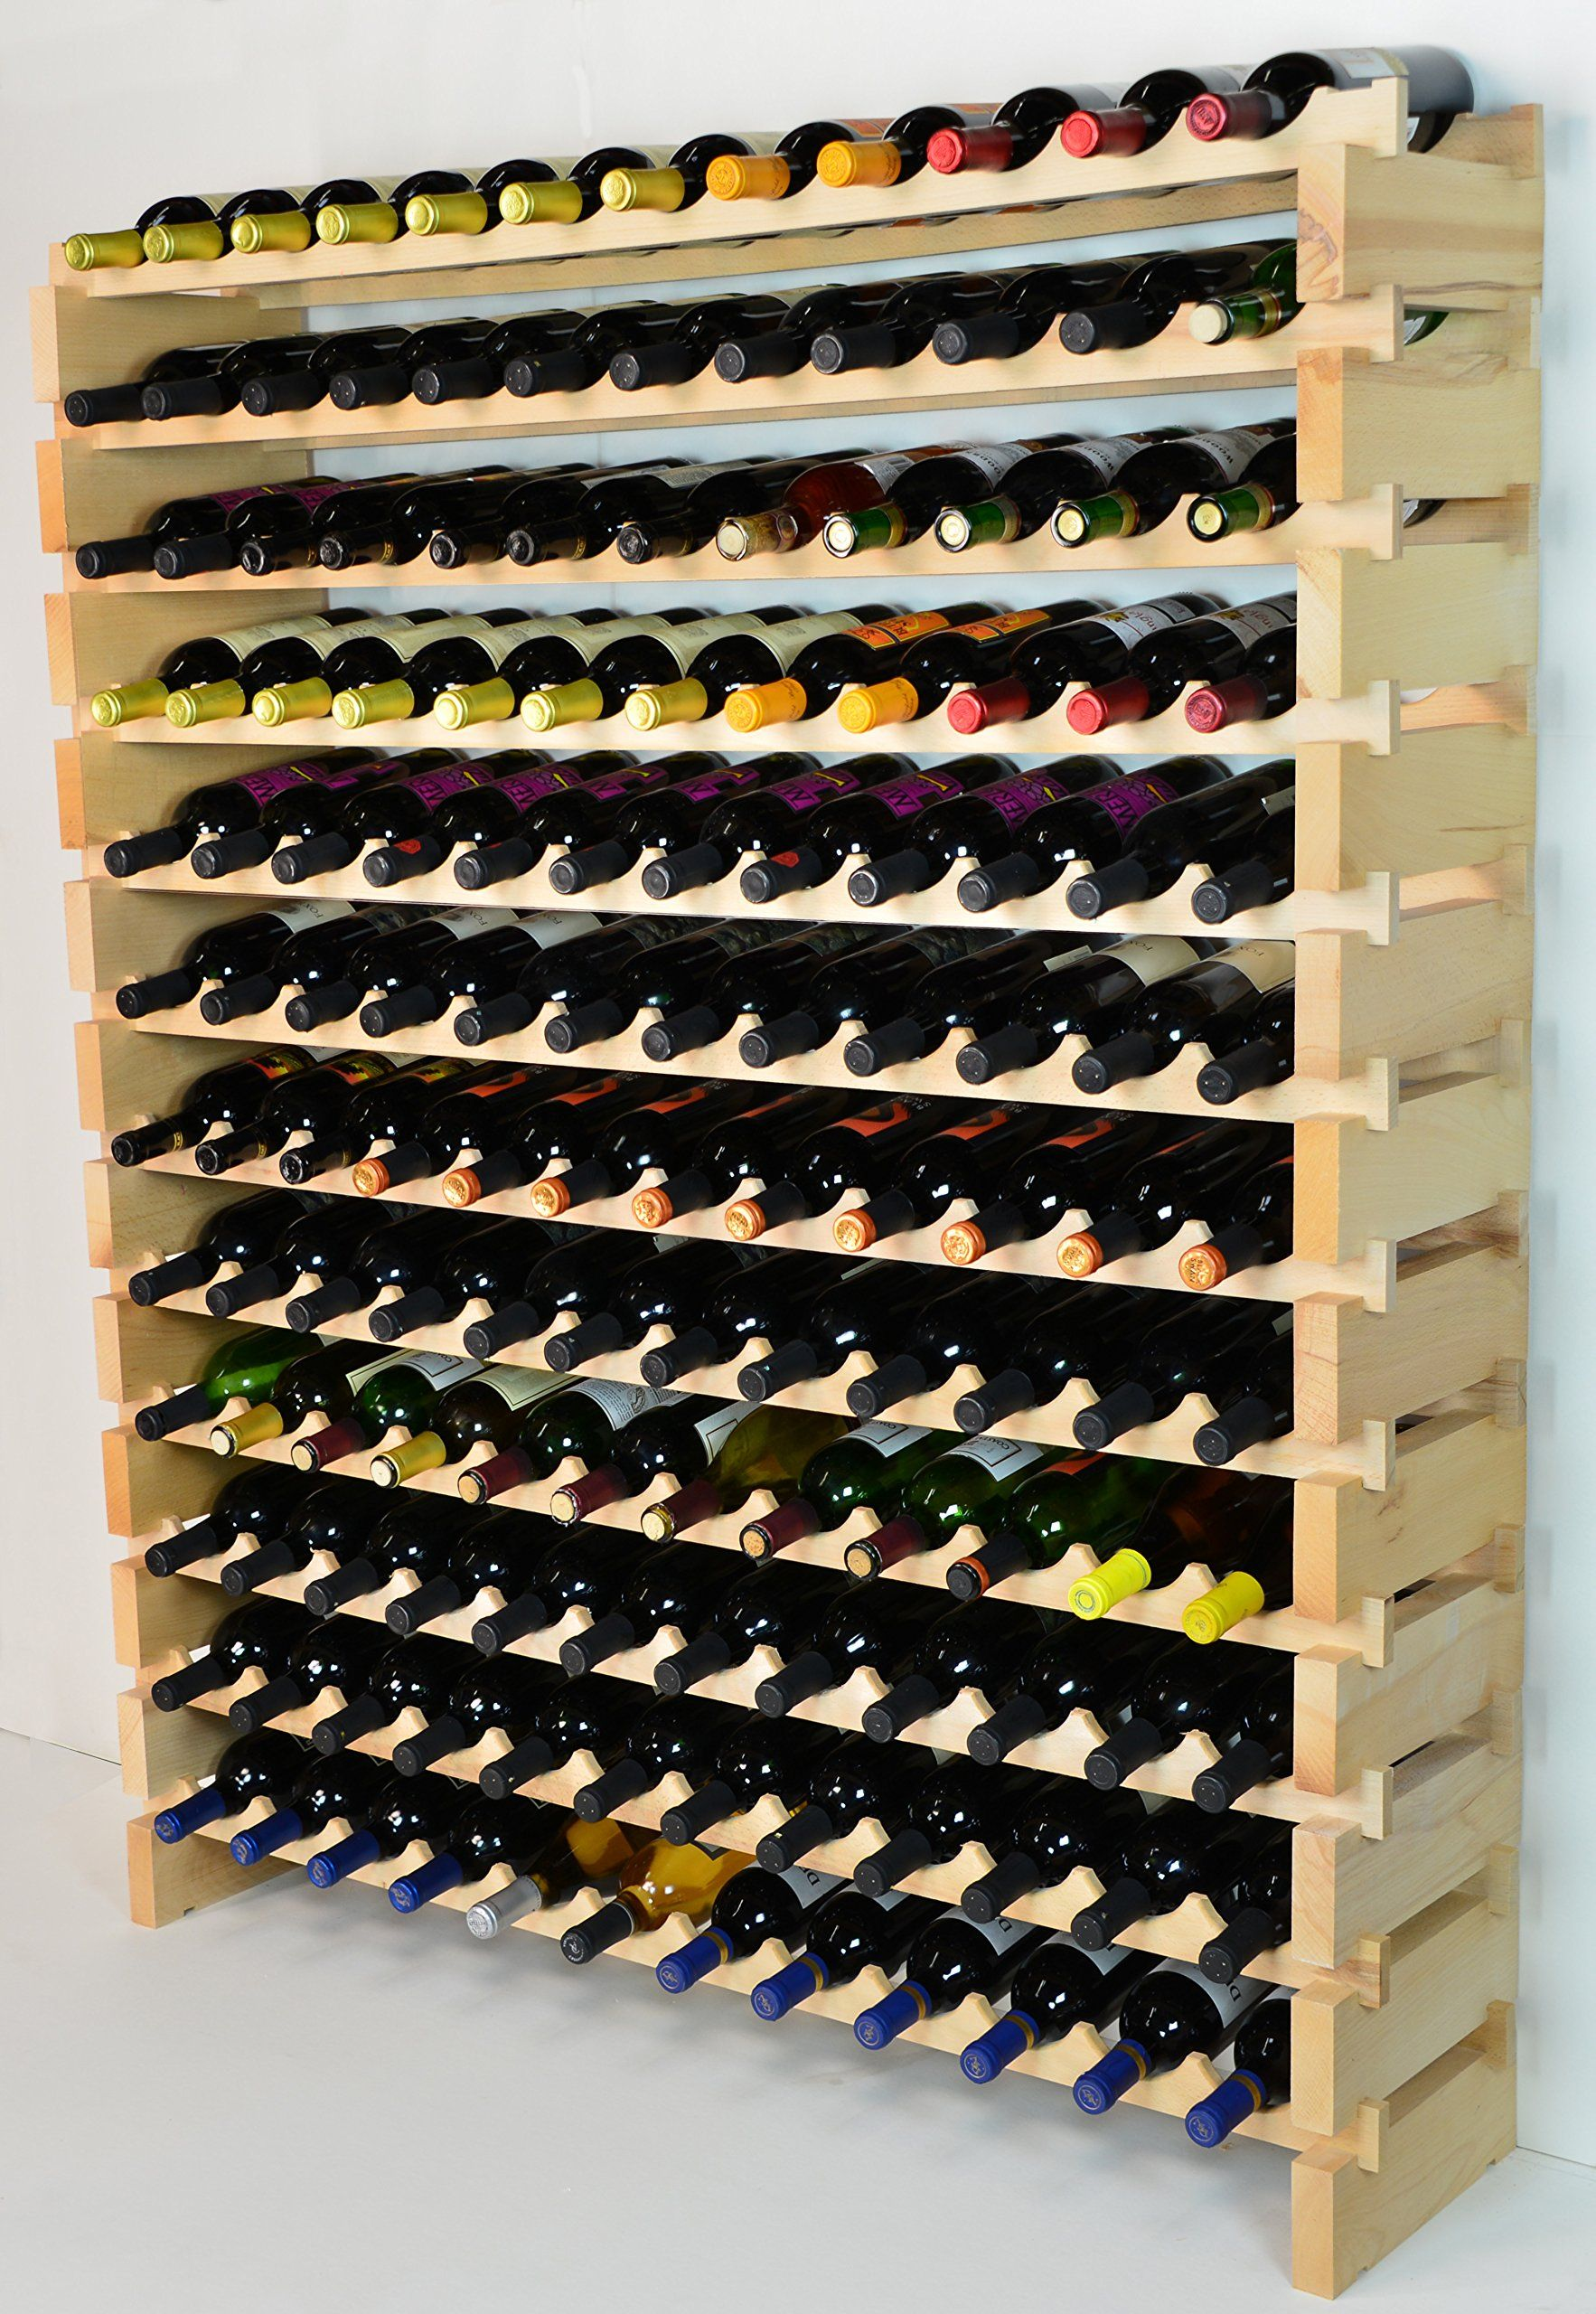 Modular Wine Rack Beechwood 48144 Bottle Capacity 12 Bottles Across